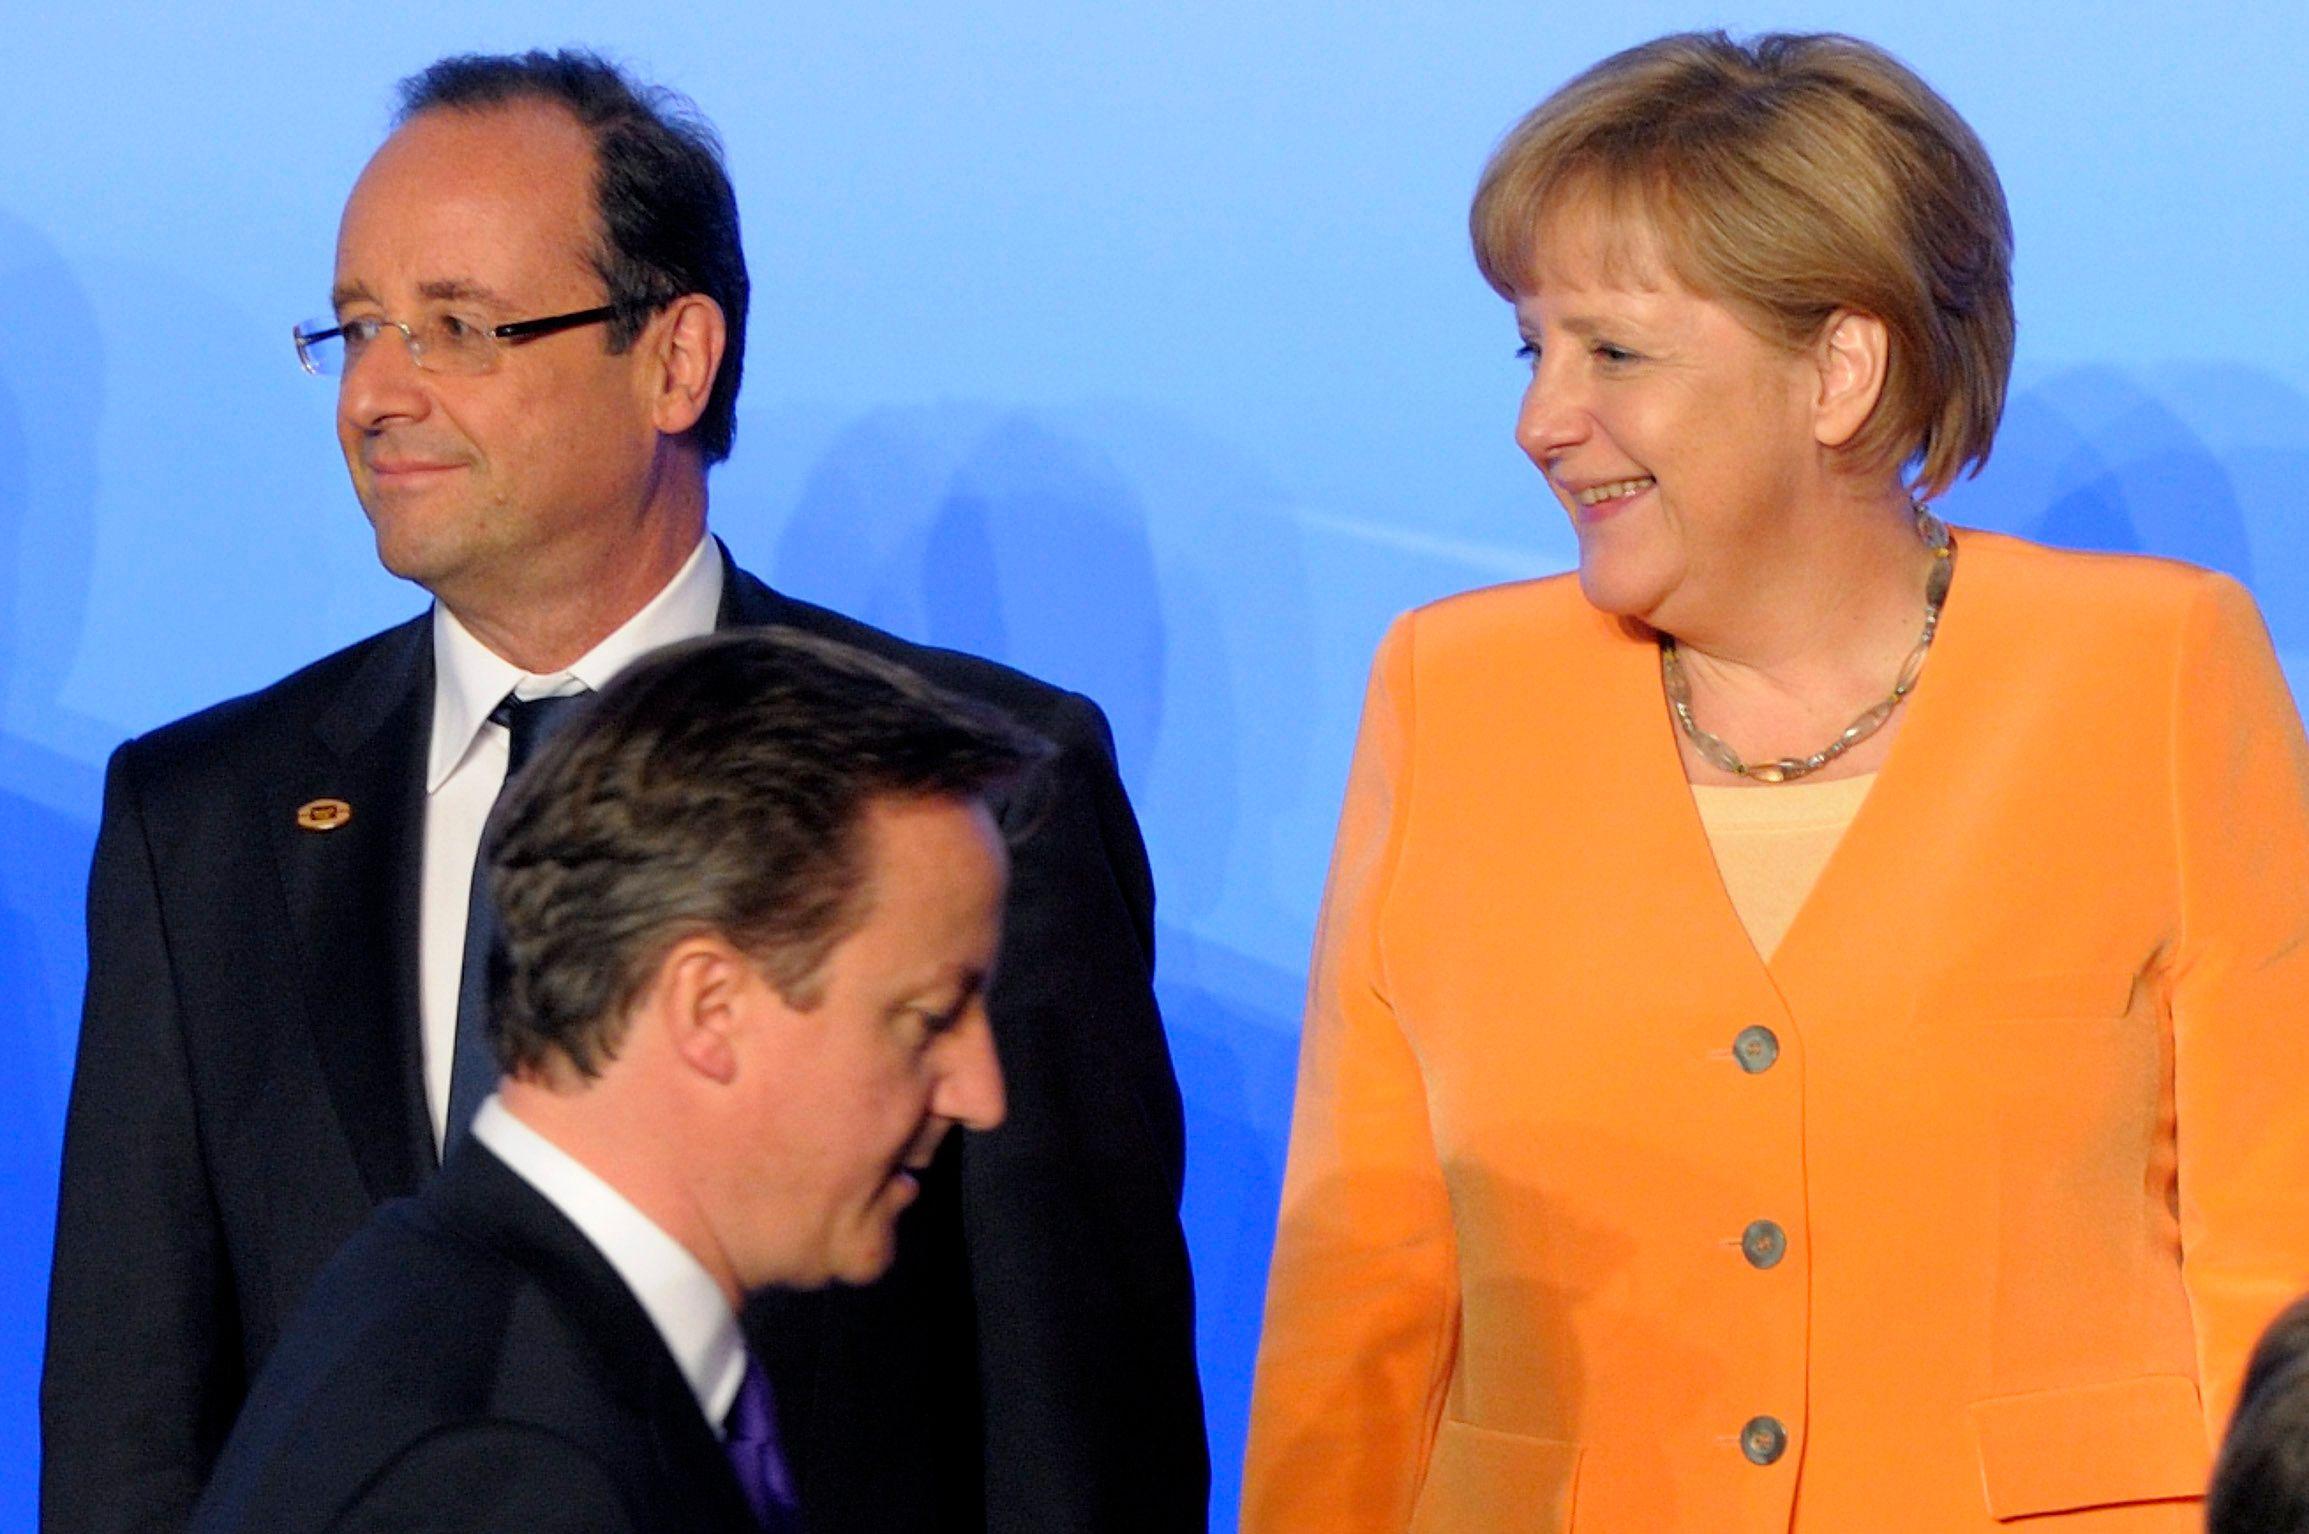 Angela Merkel a convié ce week-end David Cameron au château Meseberg.